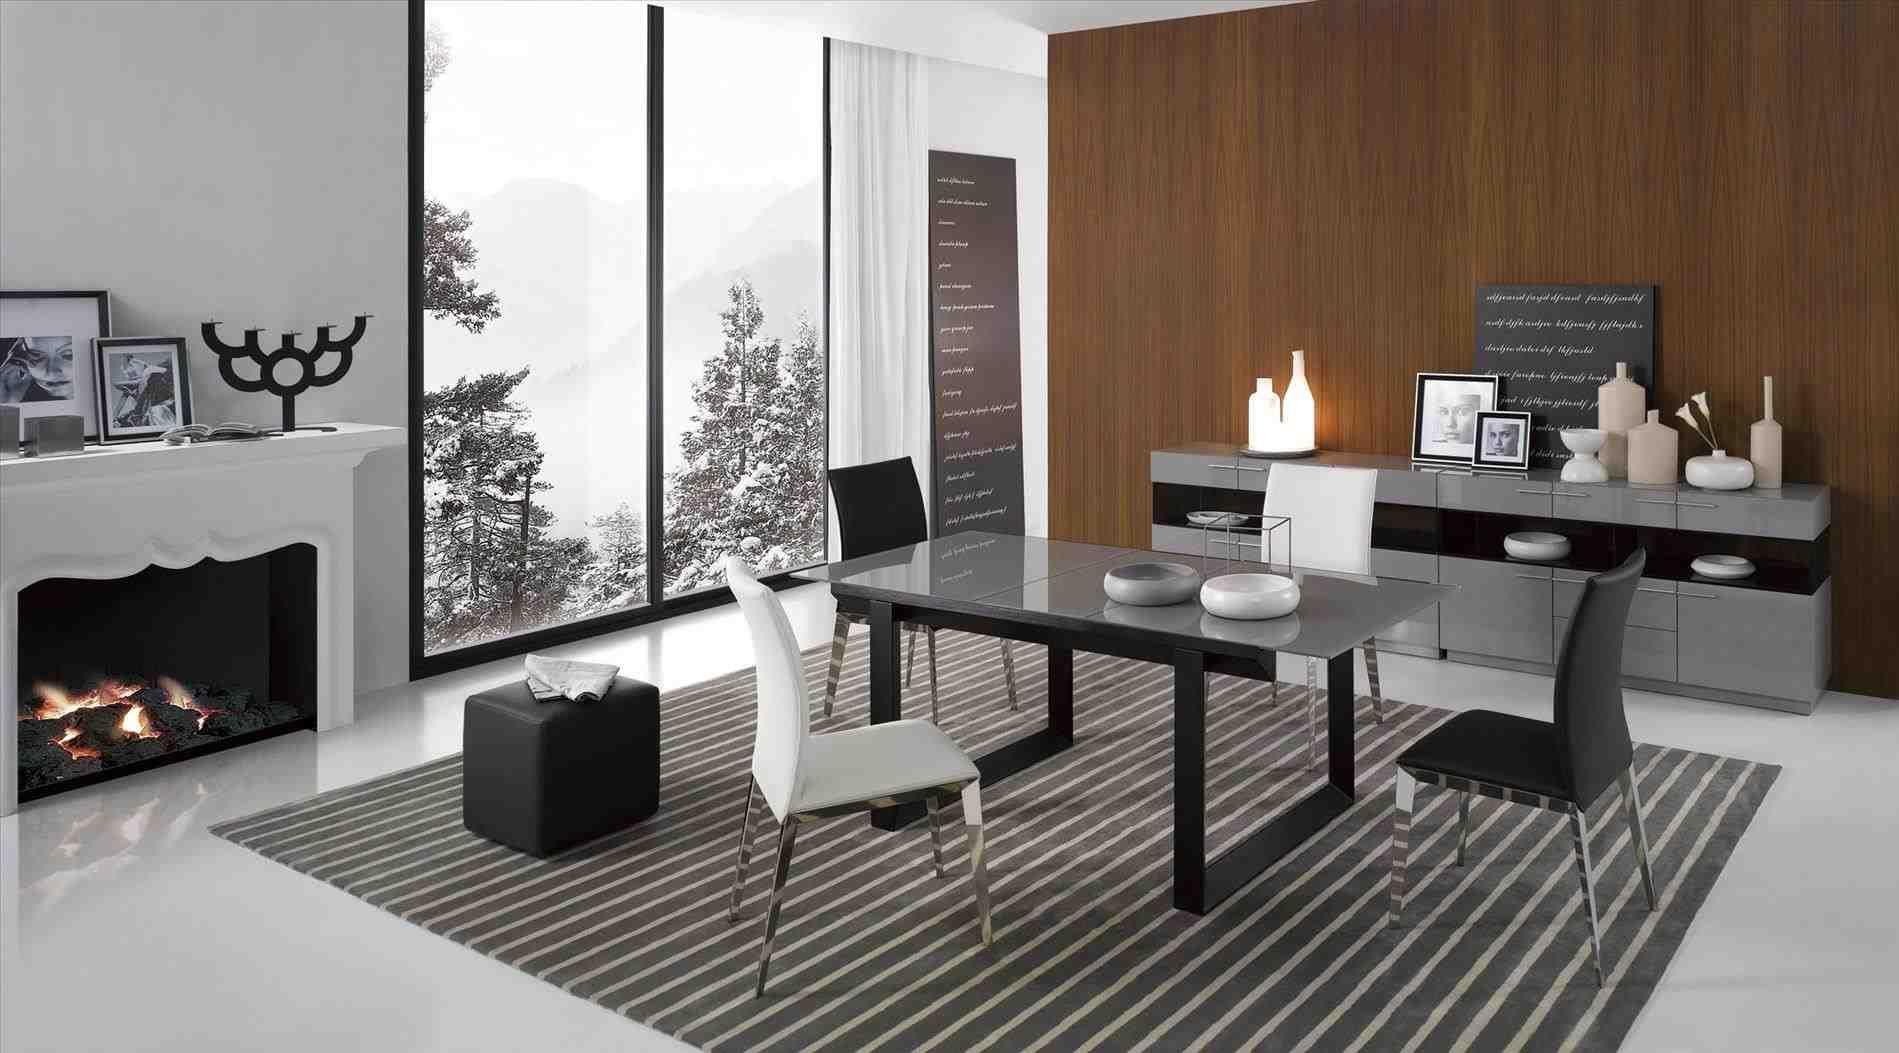 Cheap Modern Furniture Dallas Interior Modern Furniture Dallas Modern Couches An Minimalist Living Room Minimalist Living Room Design Office Furniture Modern